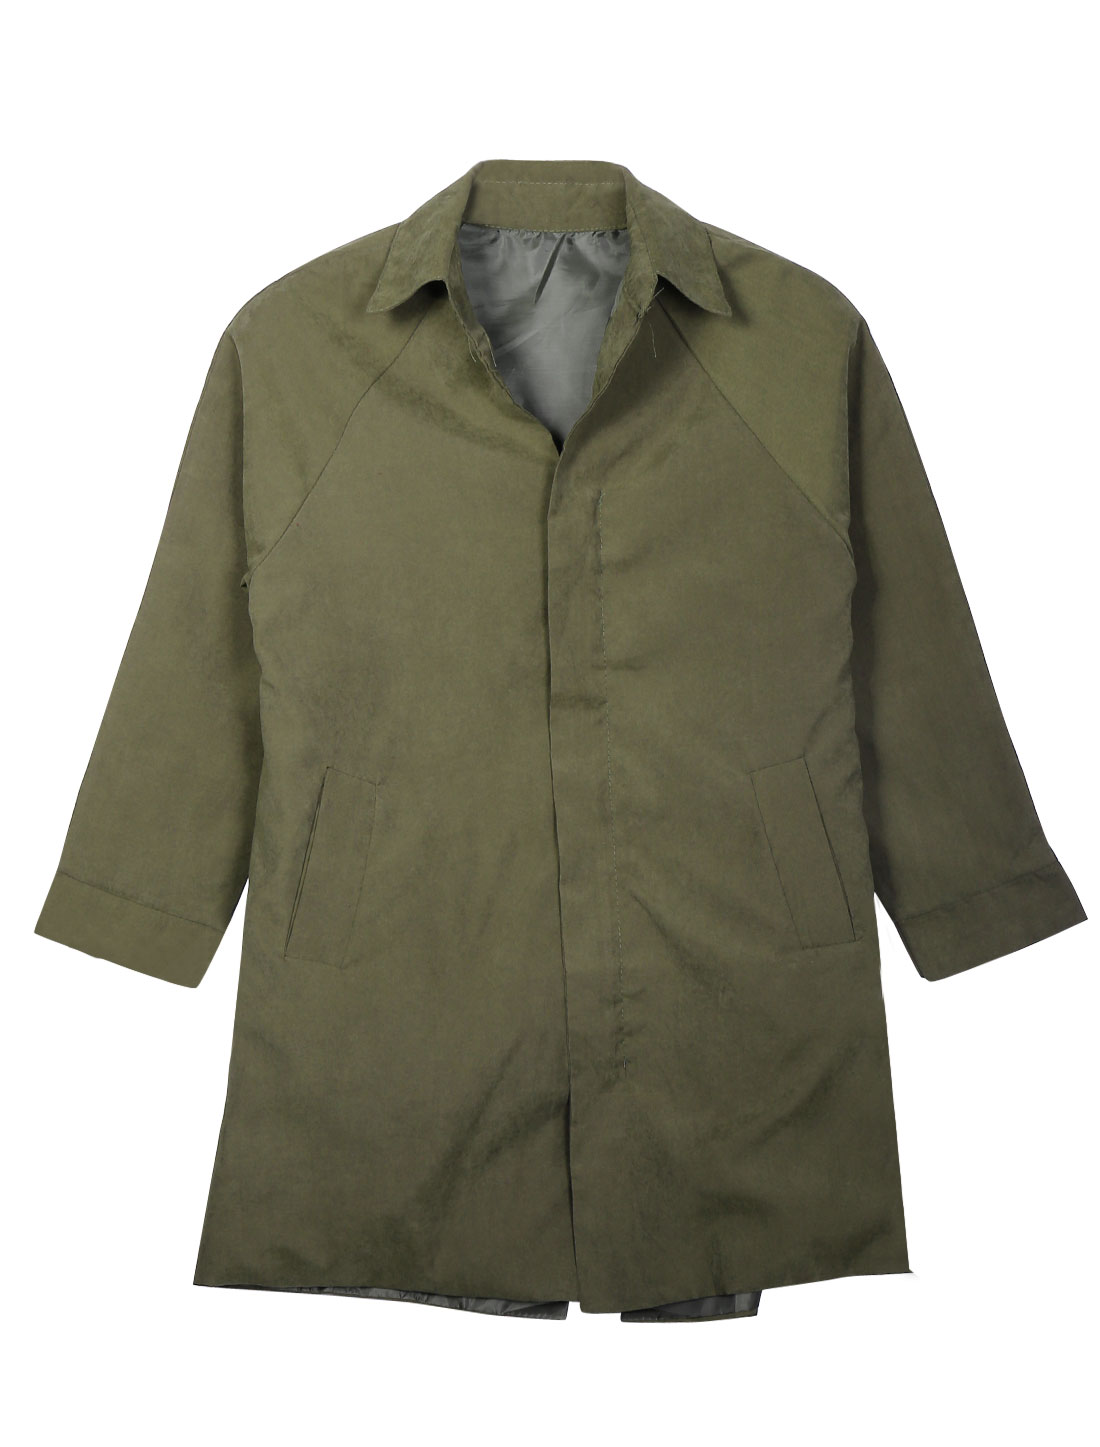 Lady Turndown Collar Long Raglan Sleeves Full Zipper Stylish Jacket Army Green S